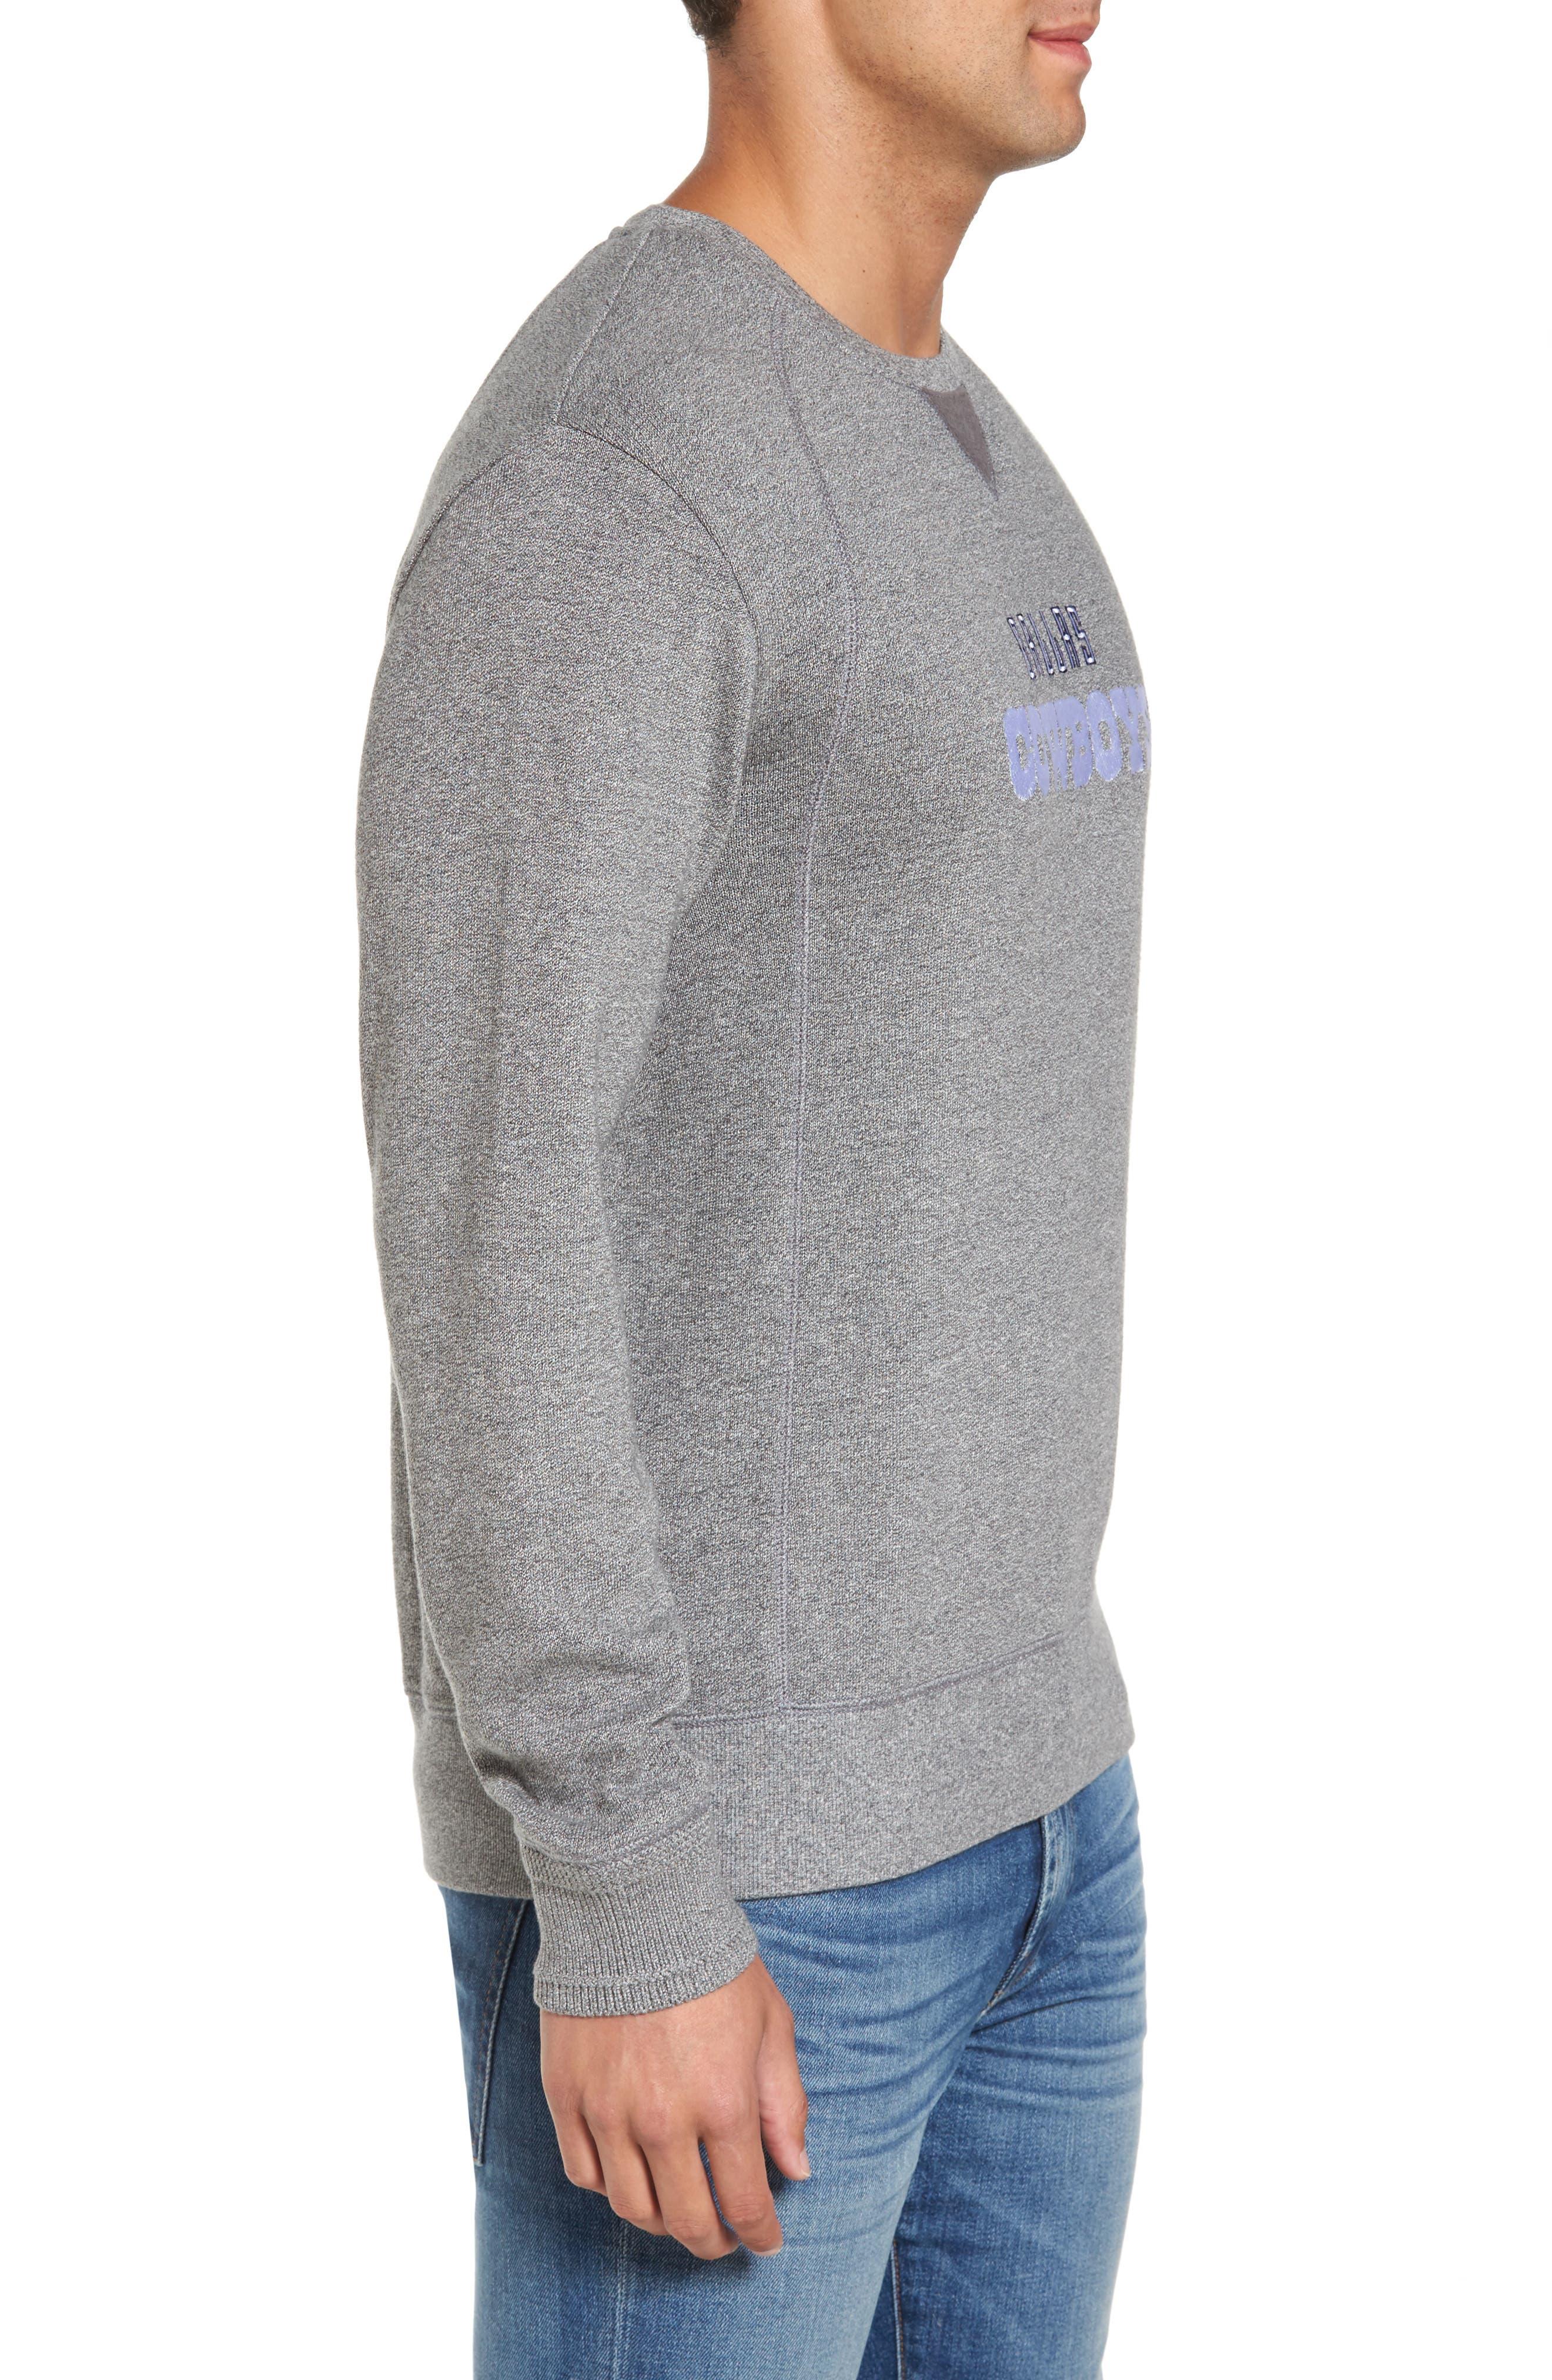 NFL Stitch of Liberty Embroidered Crewneck Sweatshirt,                             Alternate thumbnail 74, color,